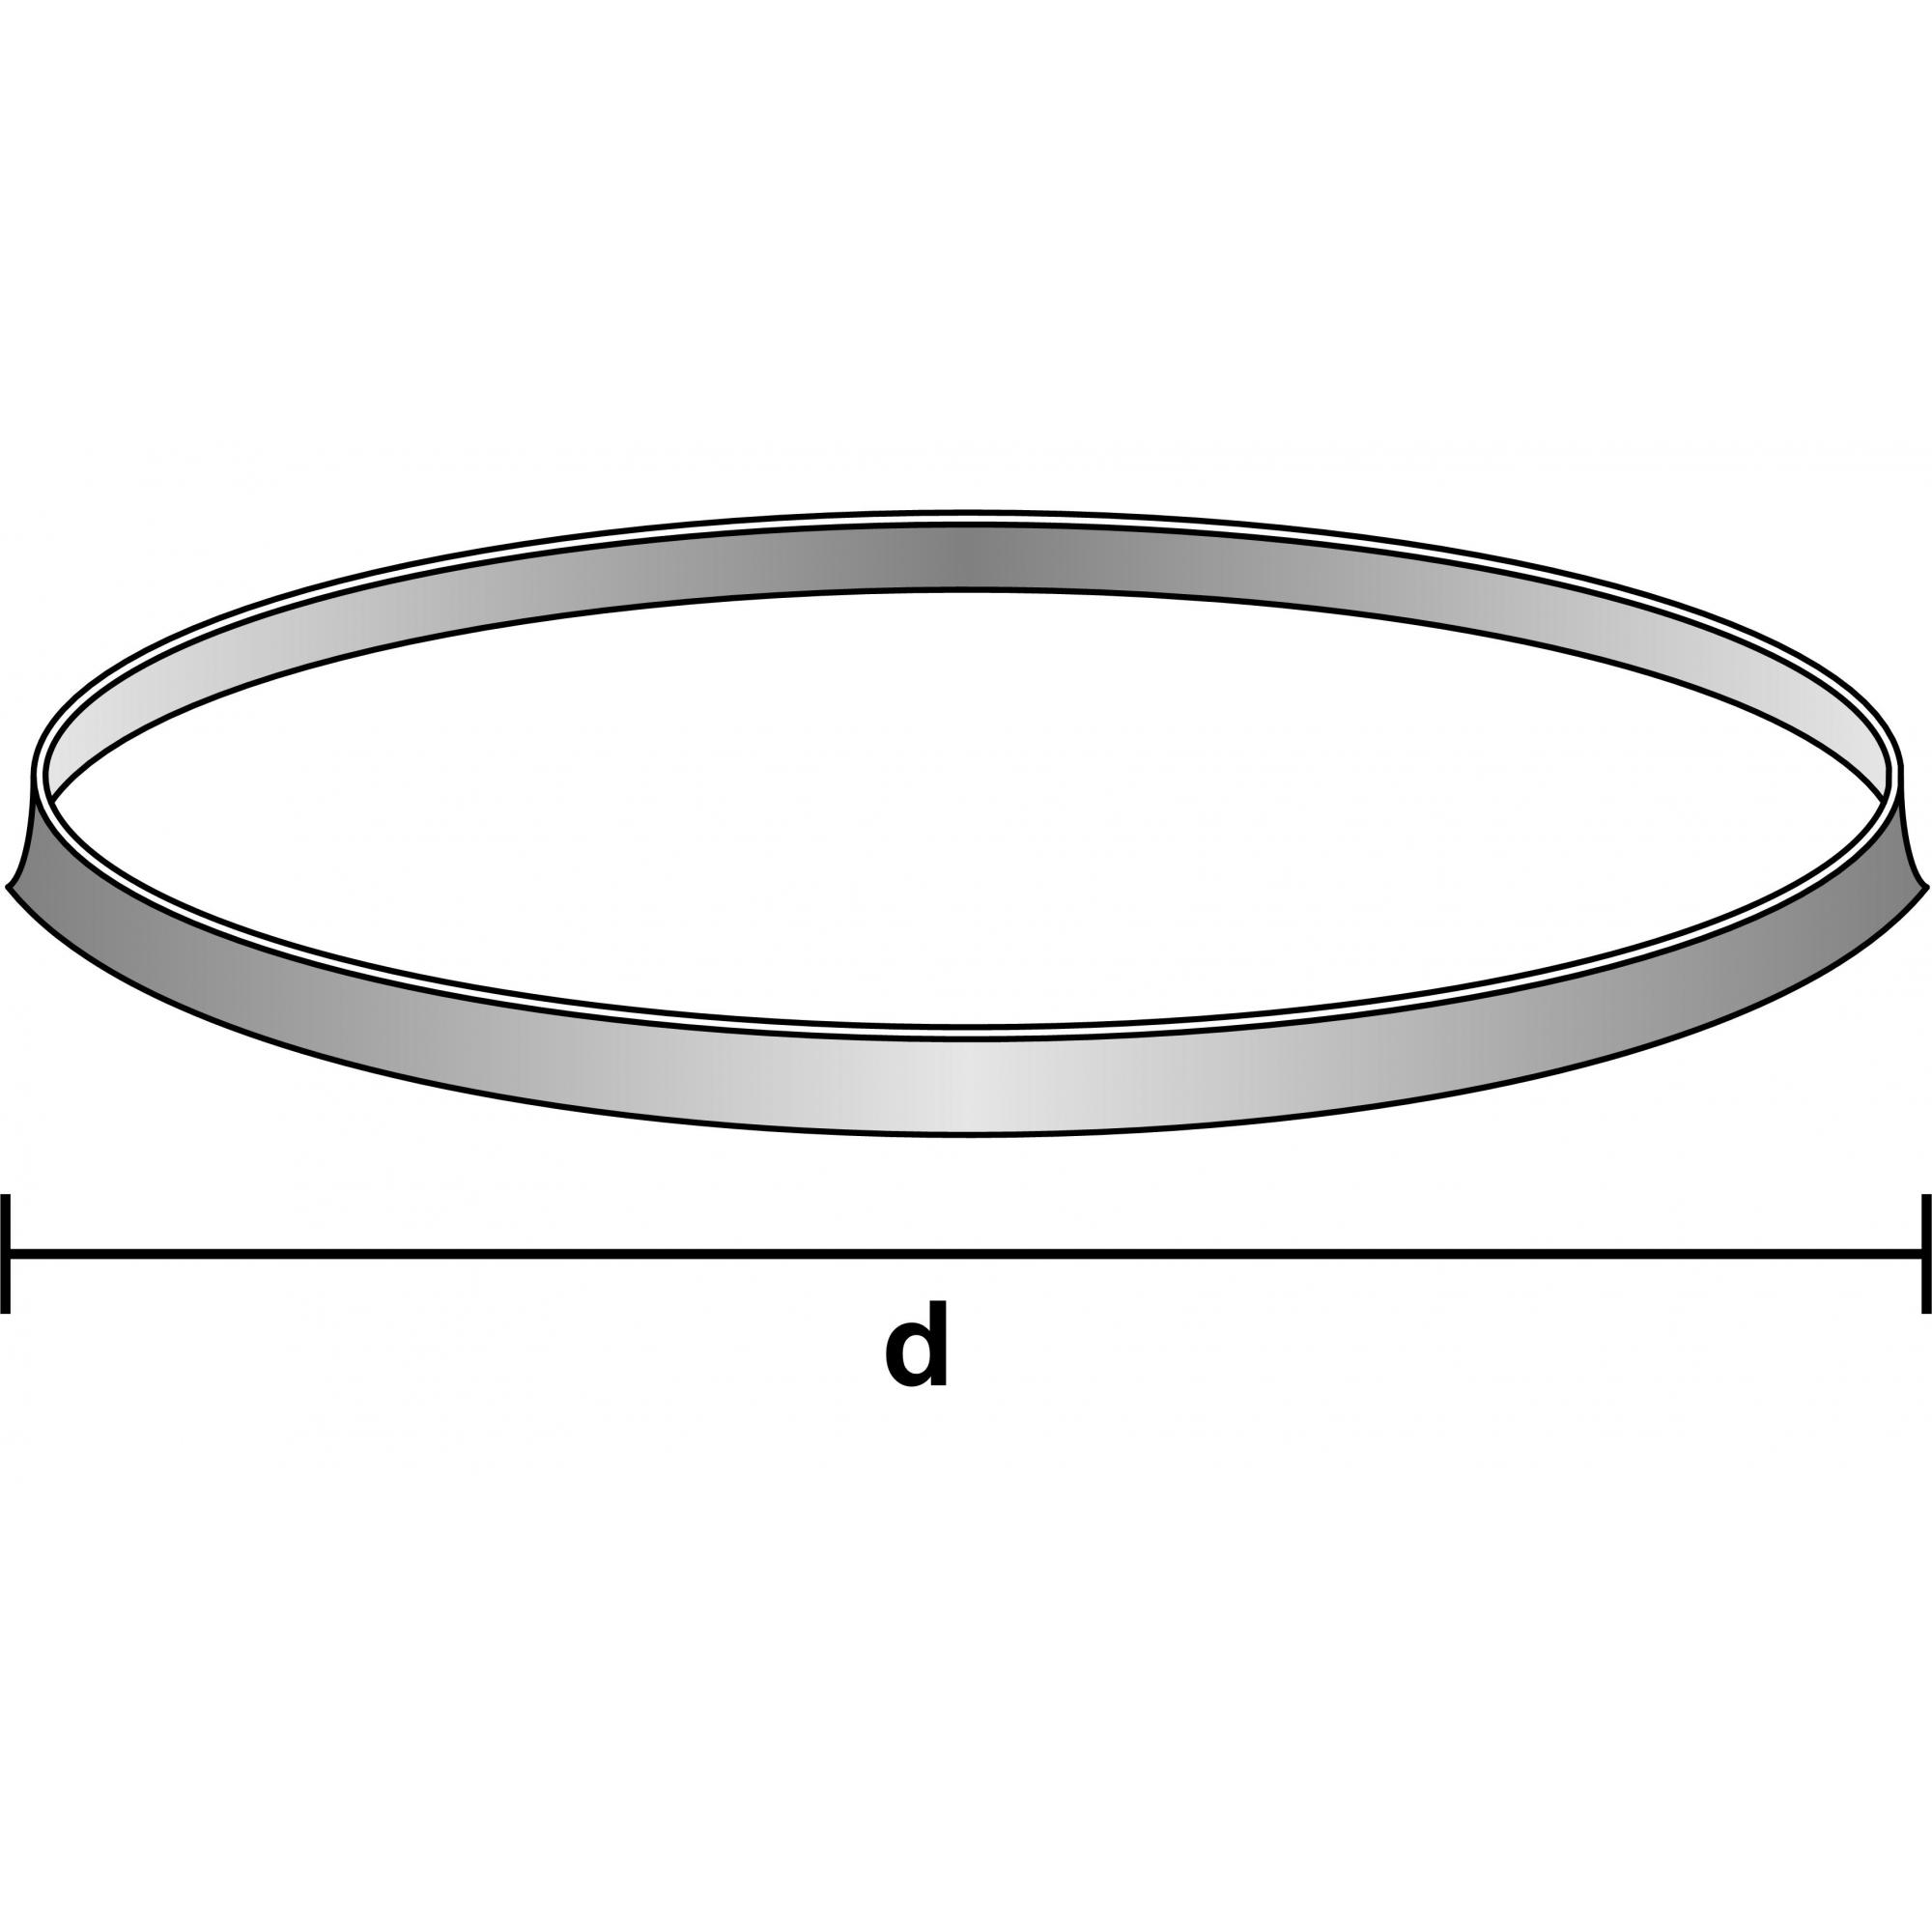 ANEL ORING EM POLIPROPILENO CINZA GL 45 - Laborglas - Cód. 9924328